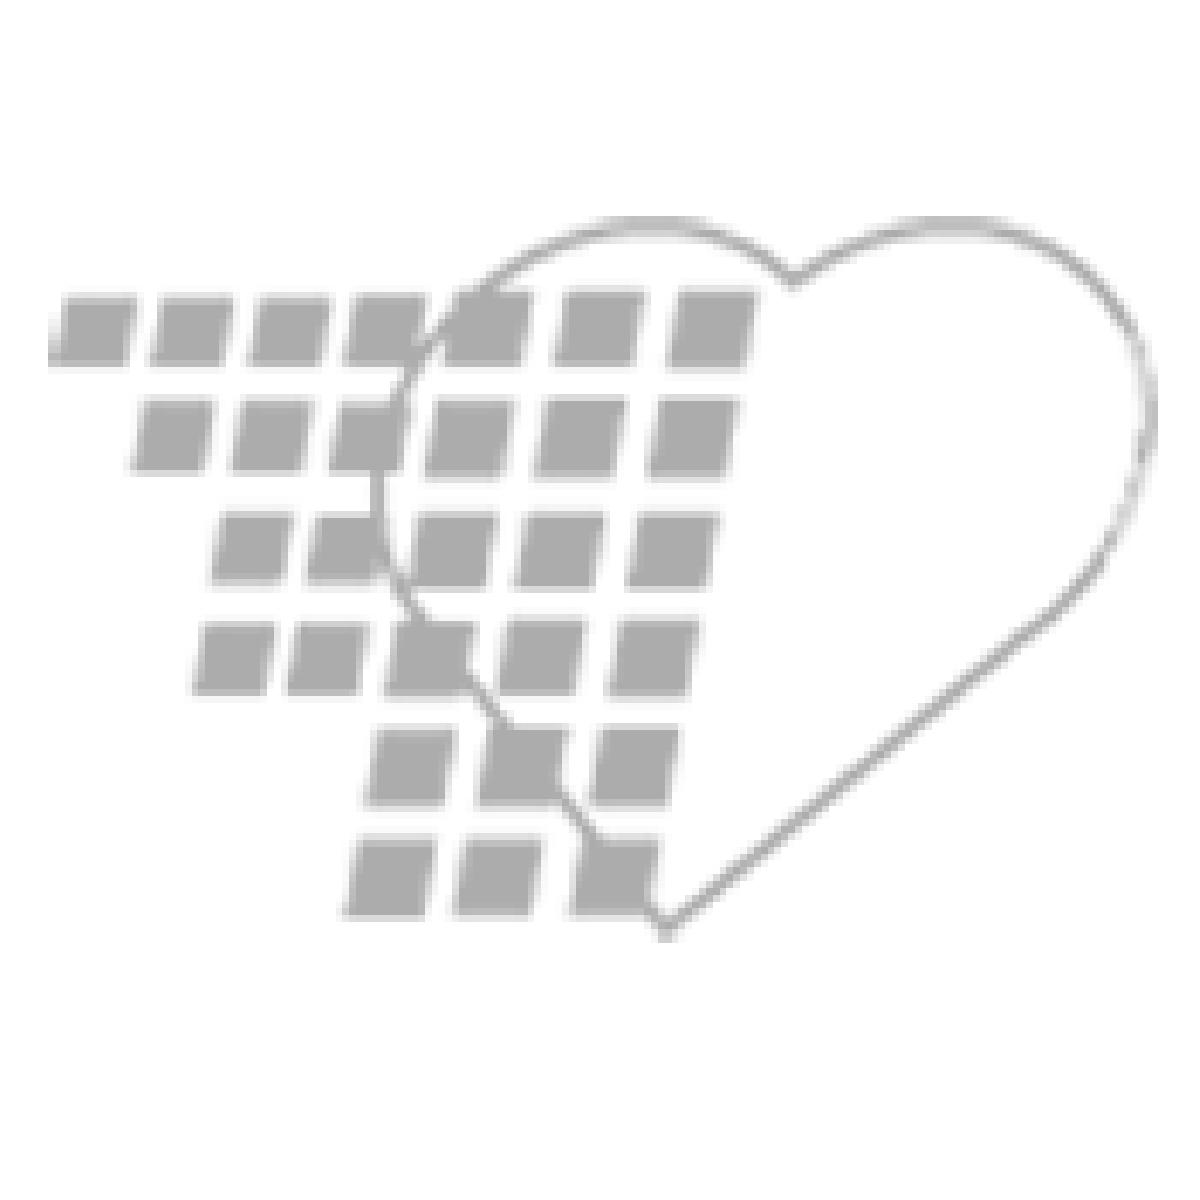 08-68-0409 - Abd  uction Pillow Medium